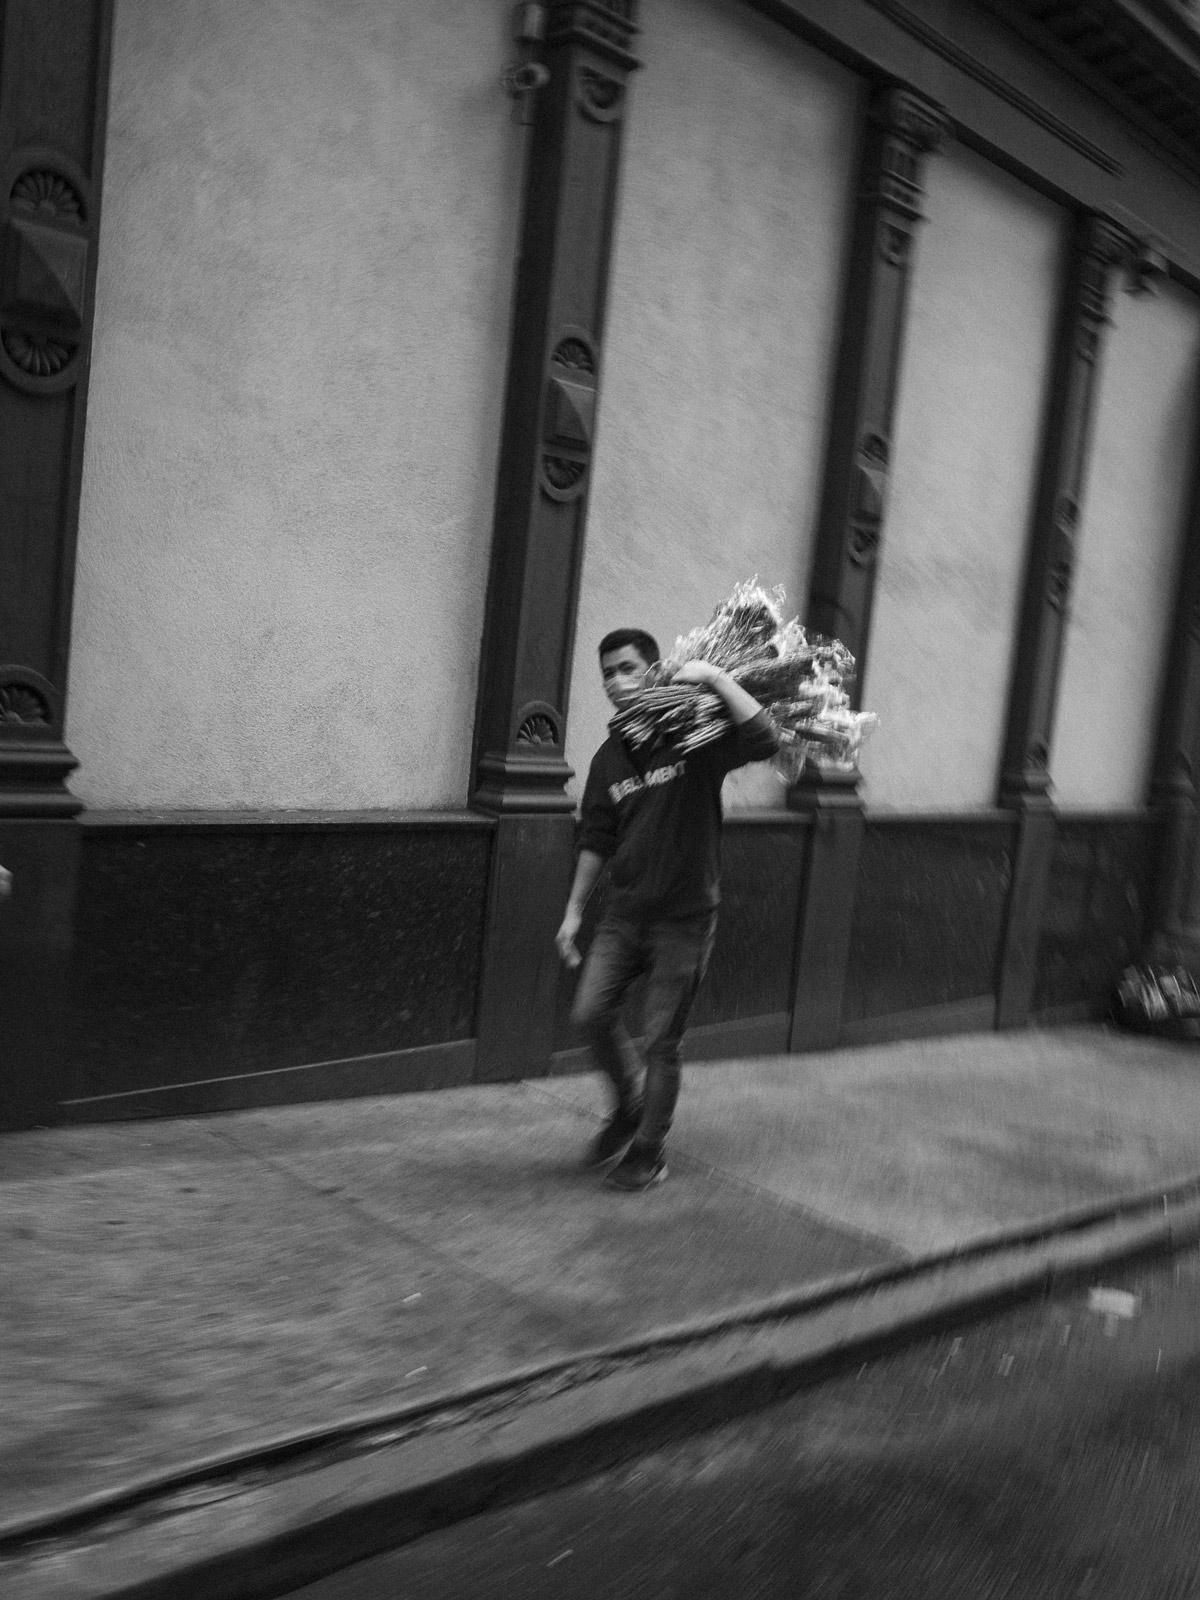 Joshua Olley captures the eerie reality of Manhattan under lockdown